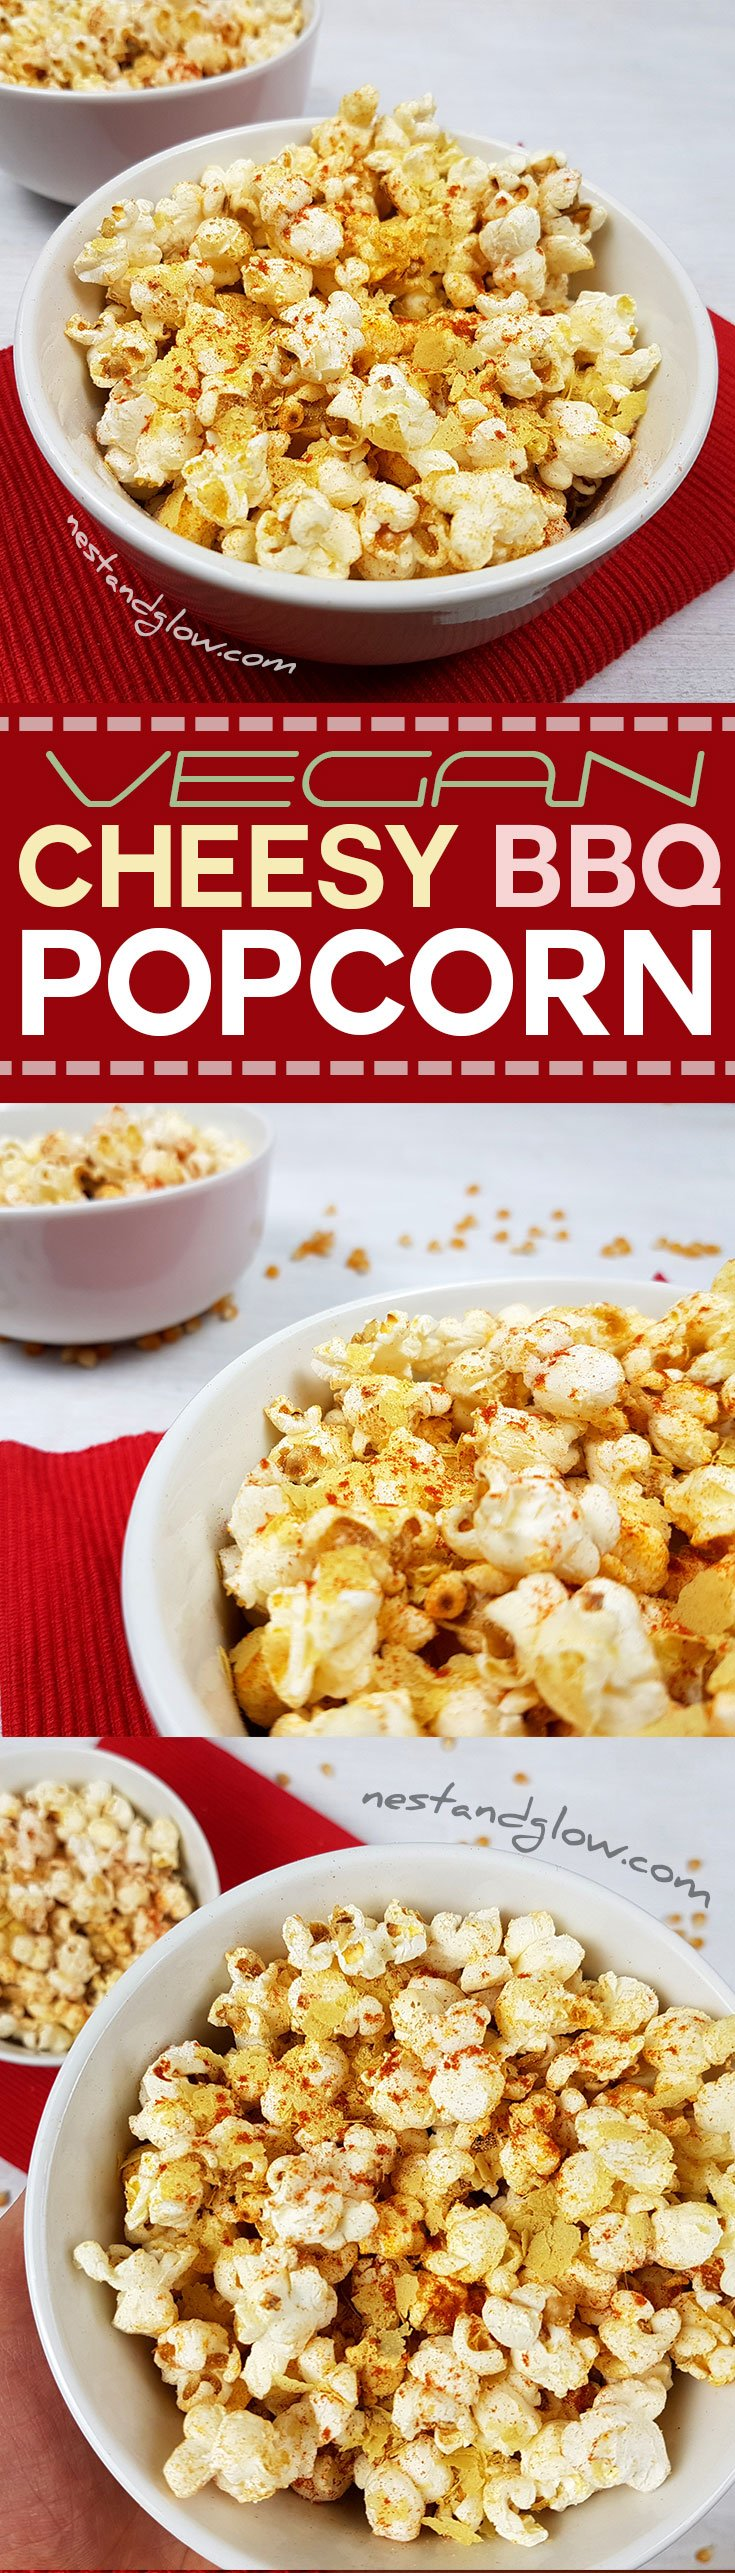 Cheesy Vegan BBQ Popcorn Healthy Recipe (Dairy and Gluten Free) - Nest ...